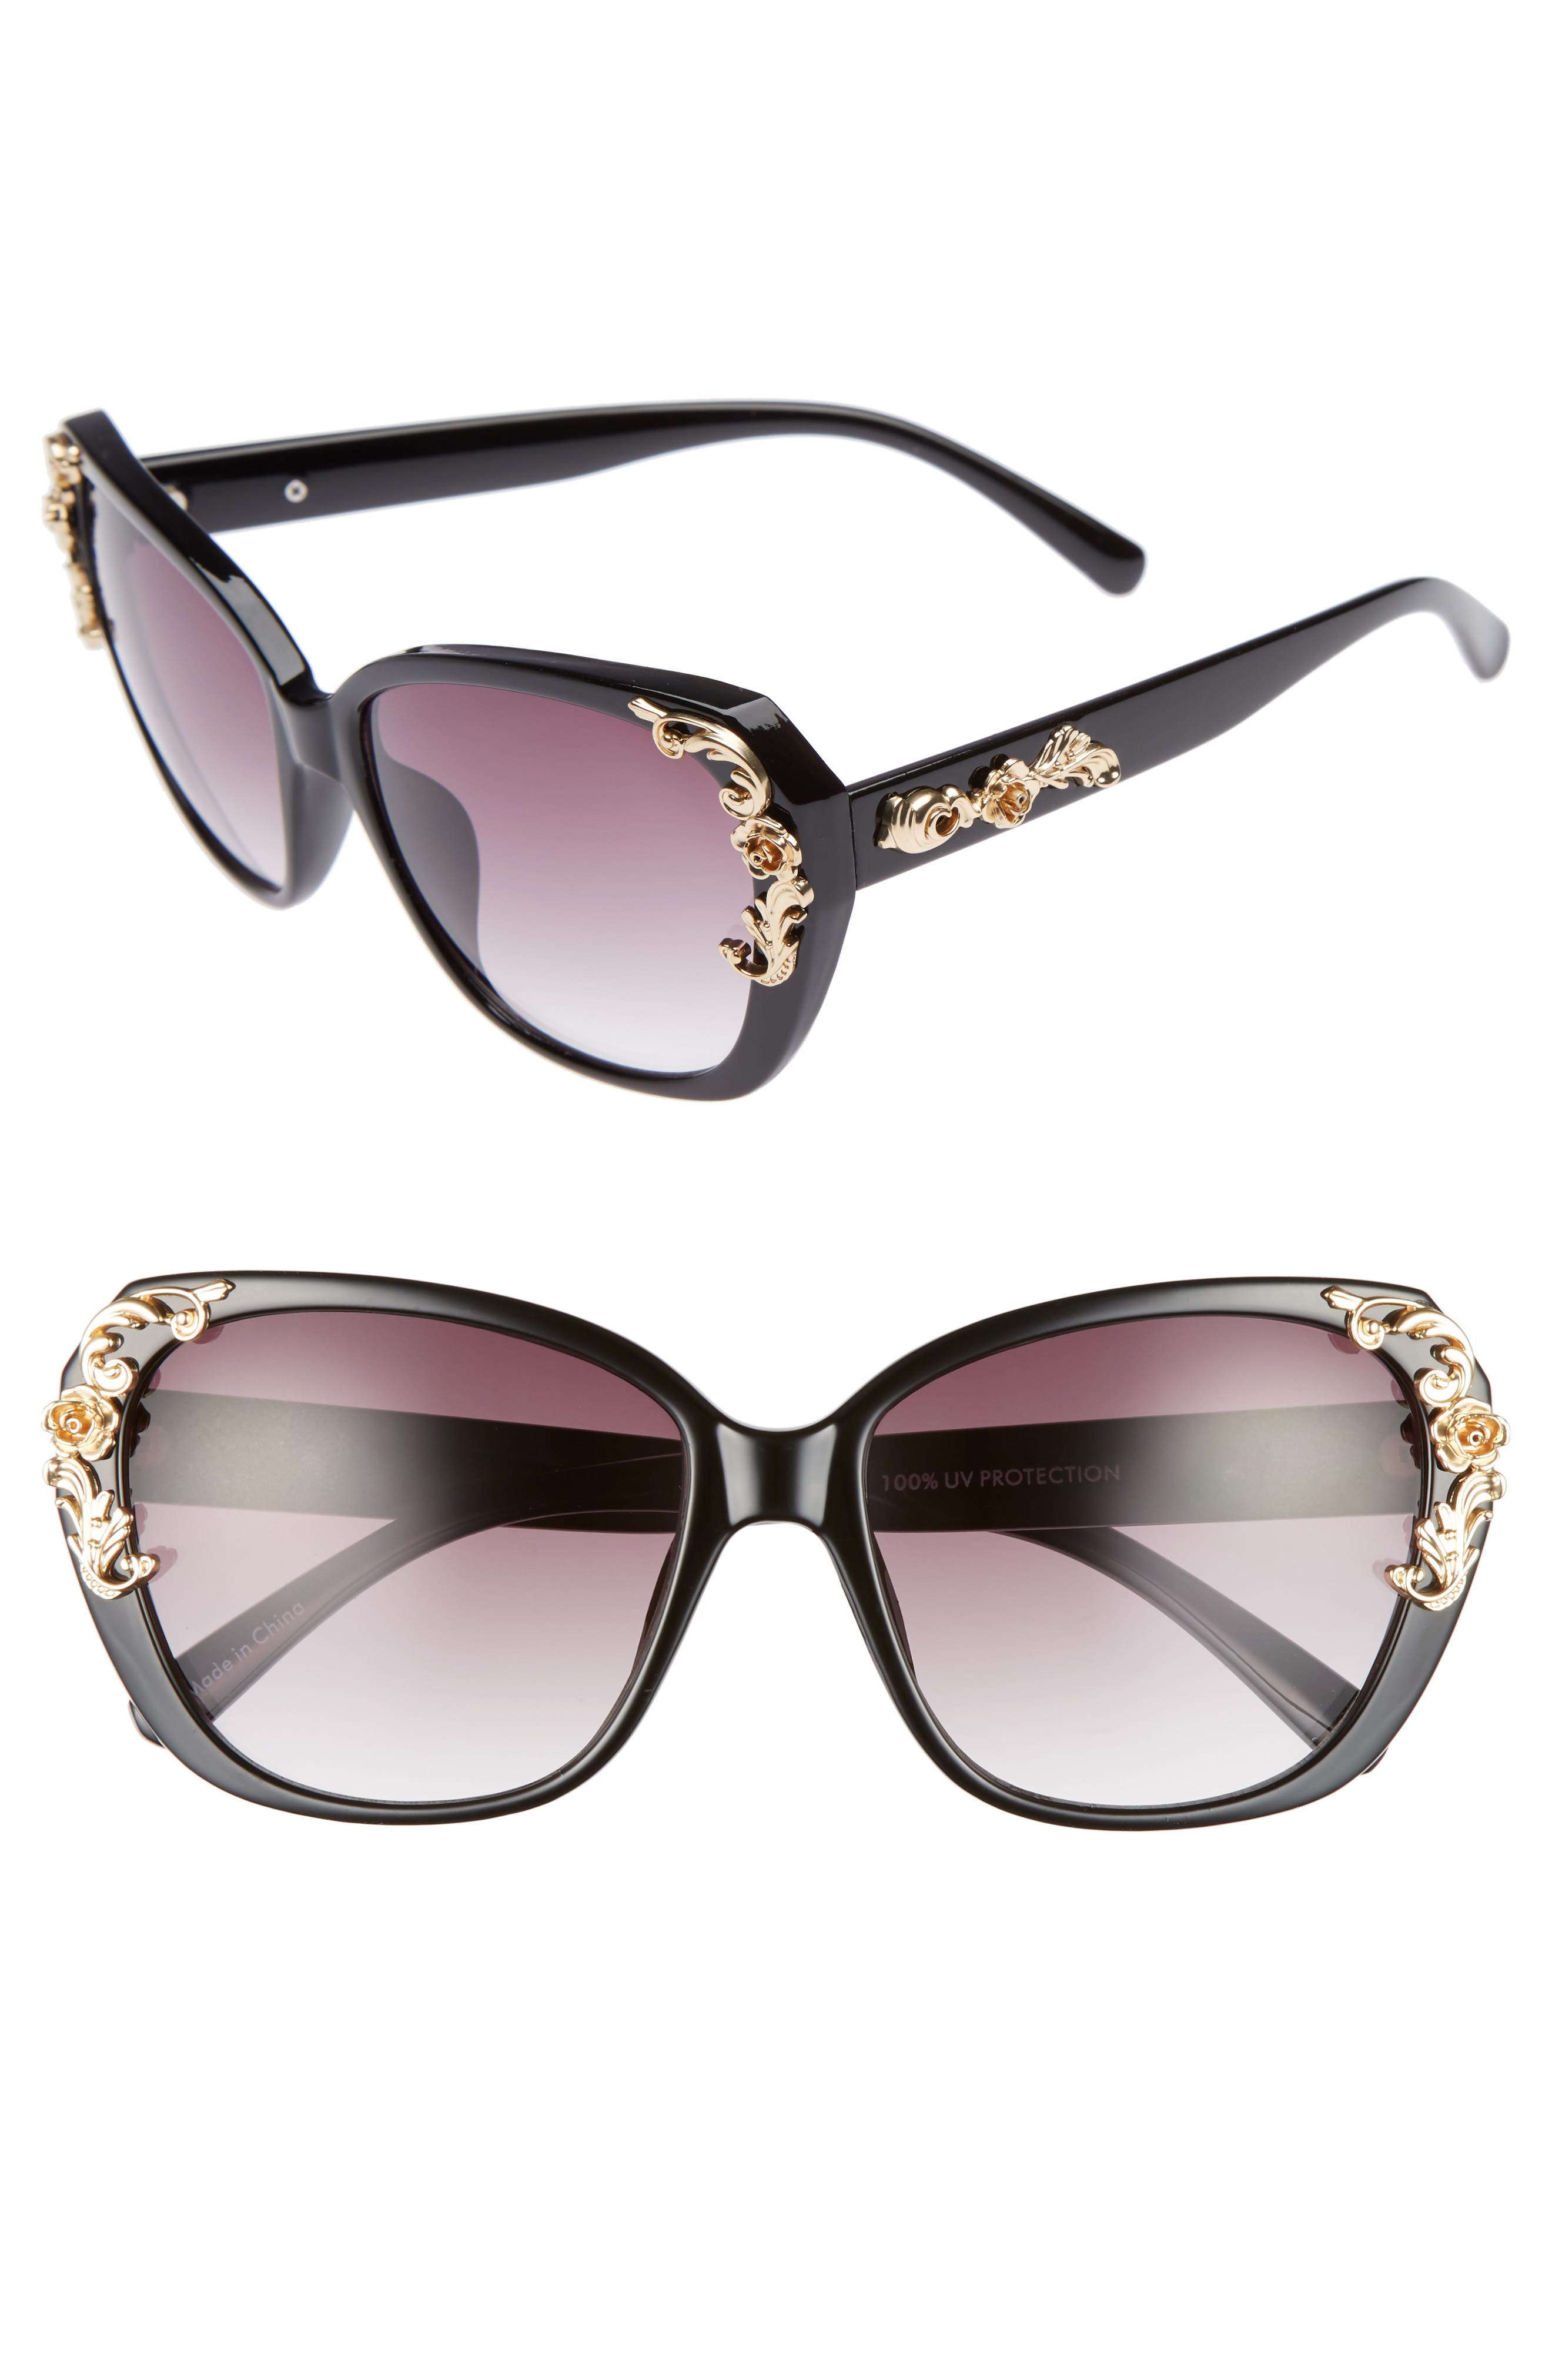 Alternate Image 1 Selected - Leith 56mm Filigree Embellished Square Sunglasses